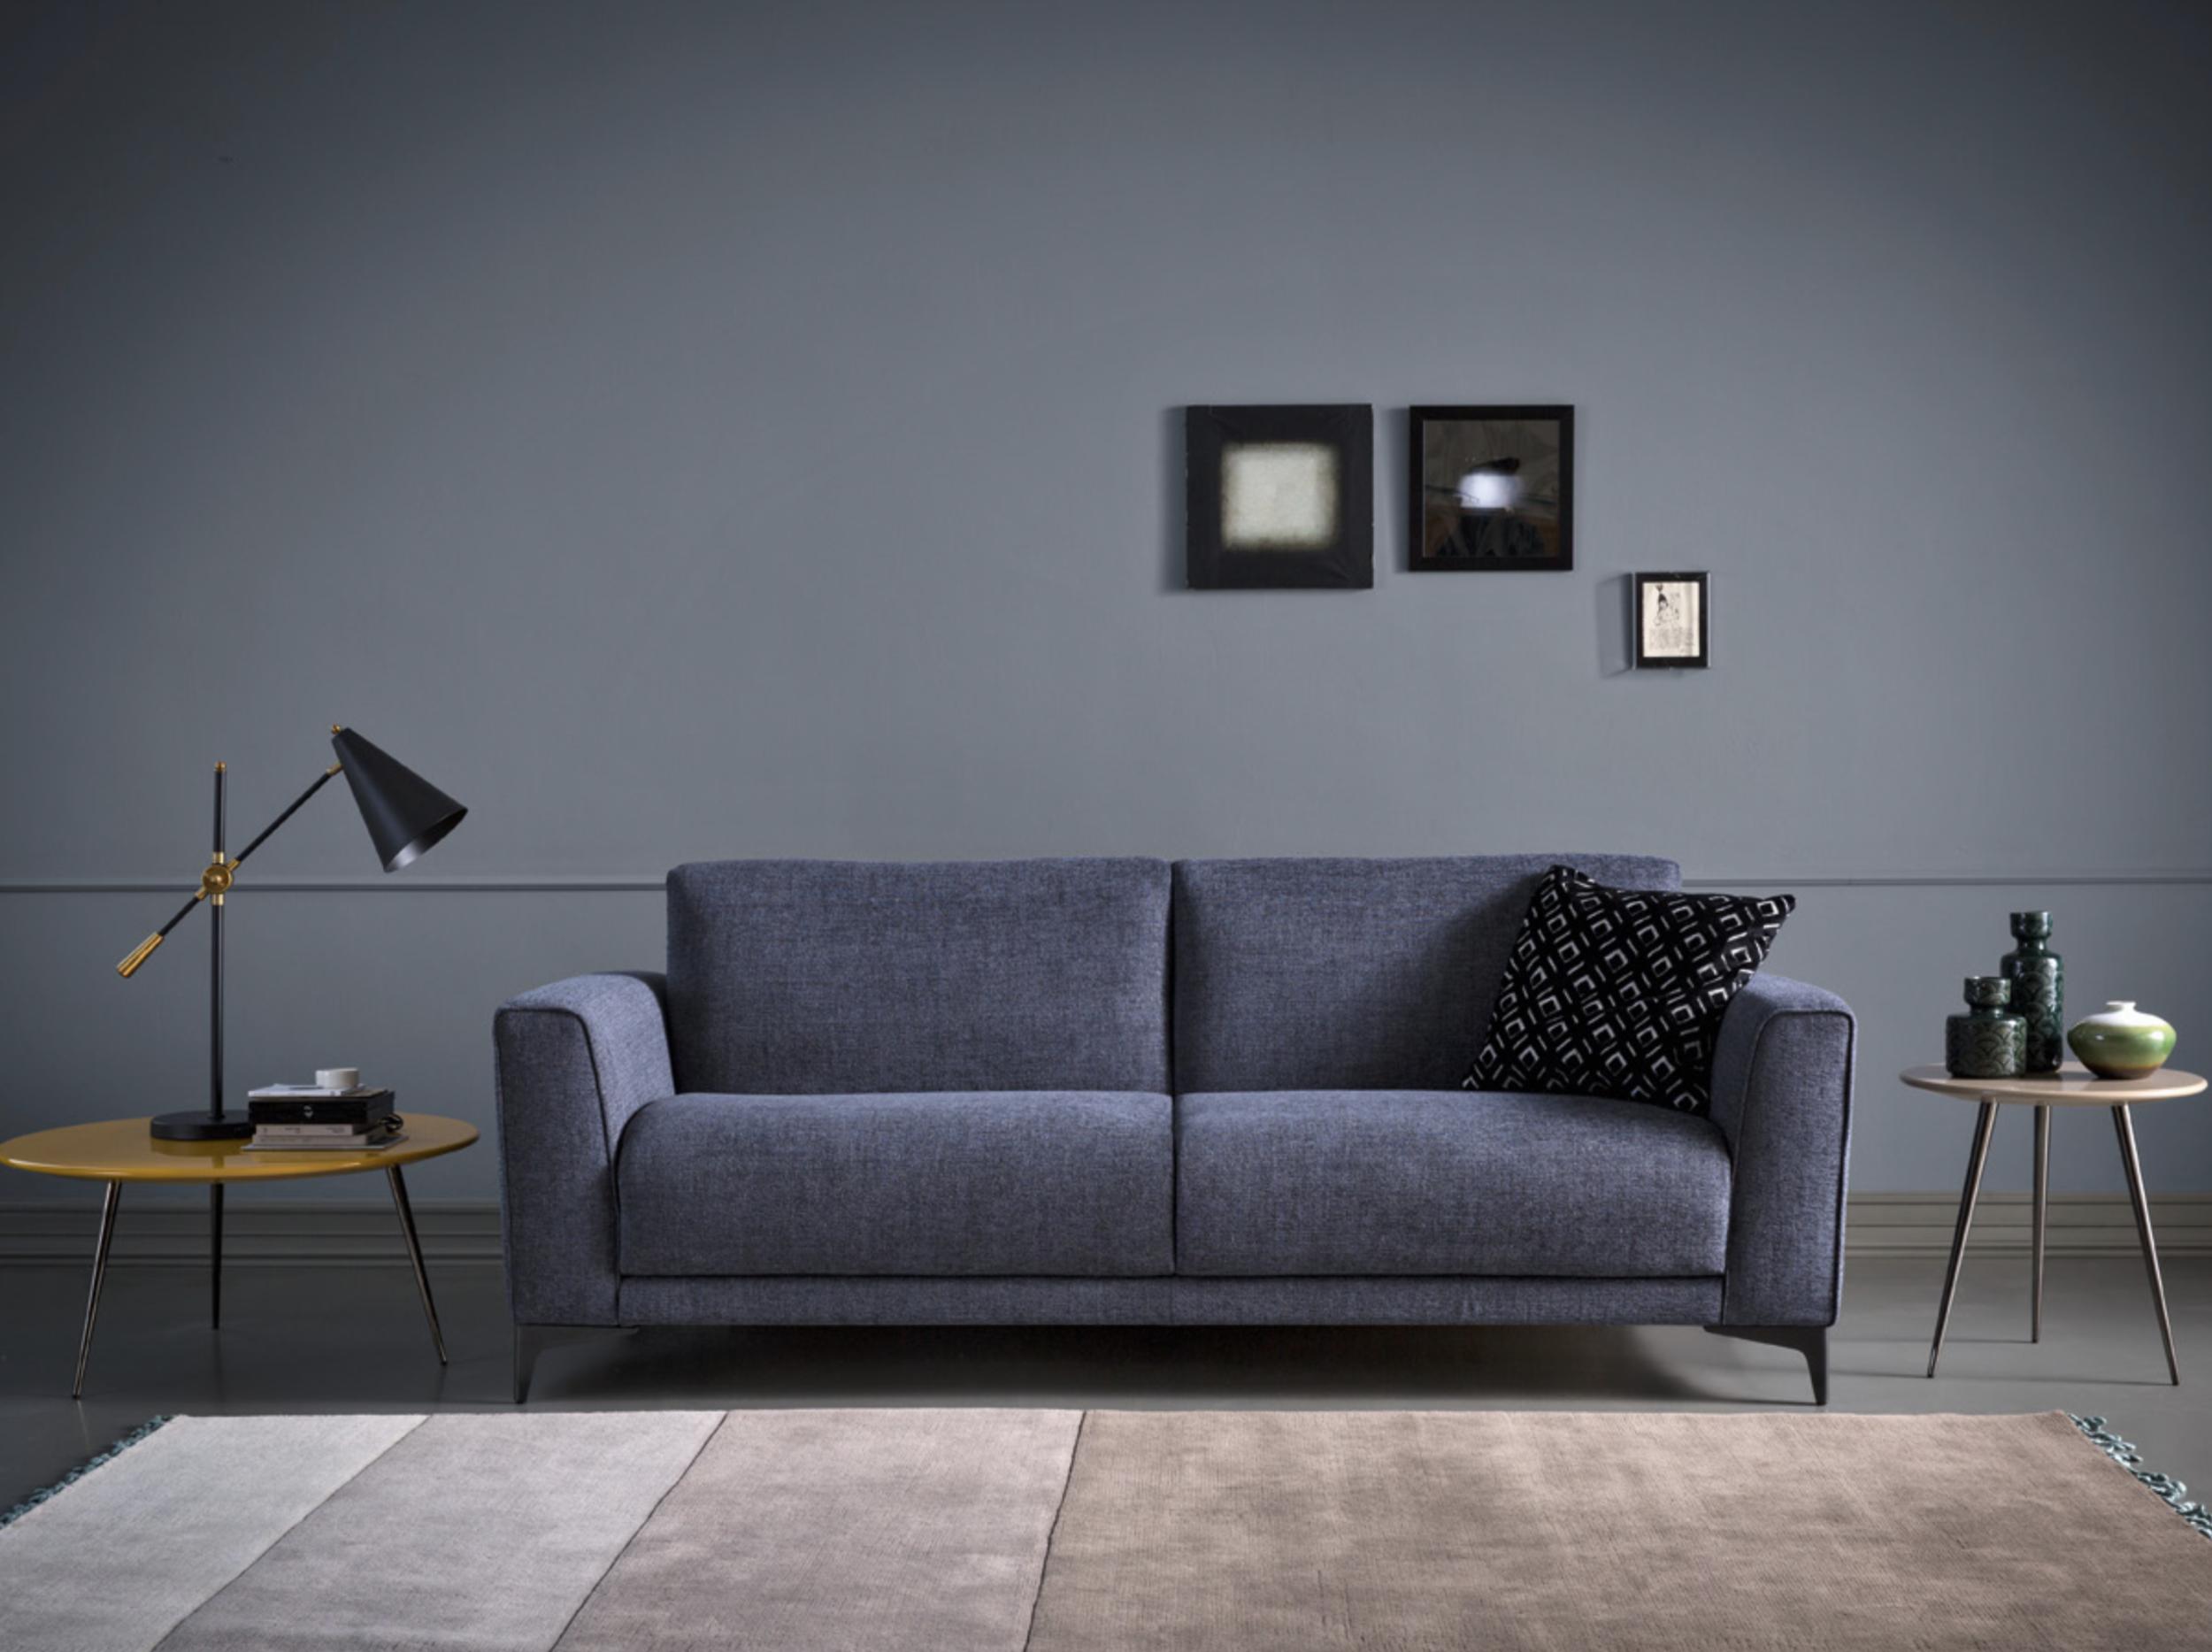 Modern Sofa Beds - Italian Designer Sofa Beds & Sleeper ...